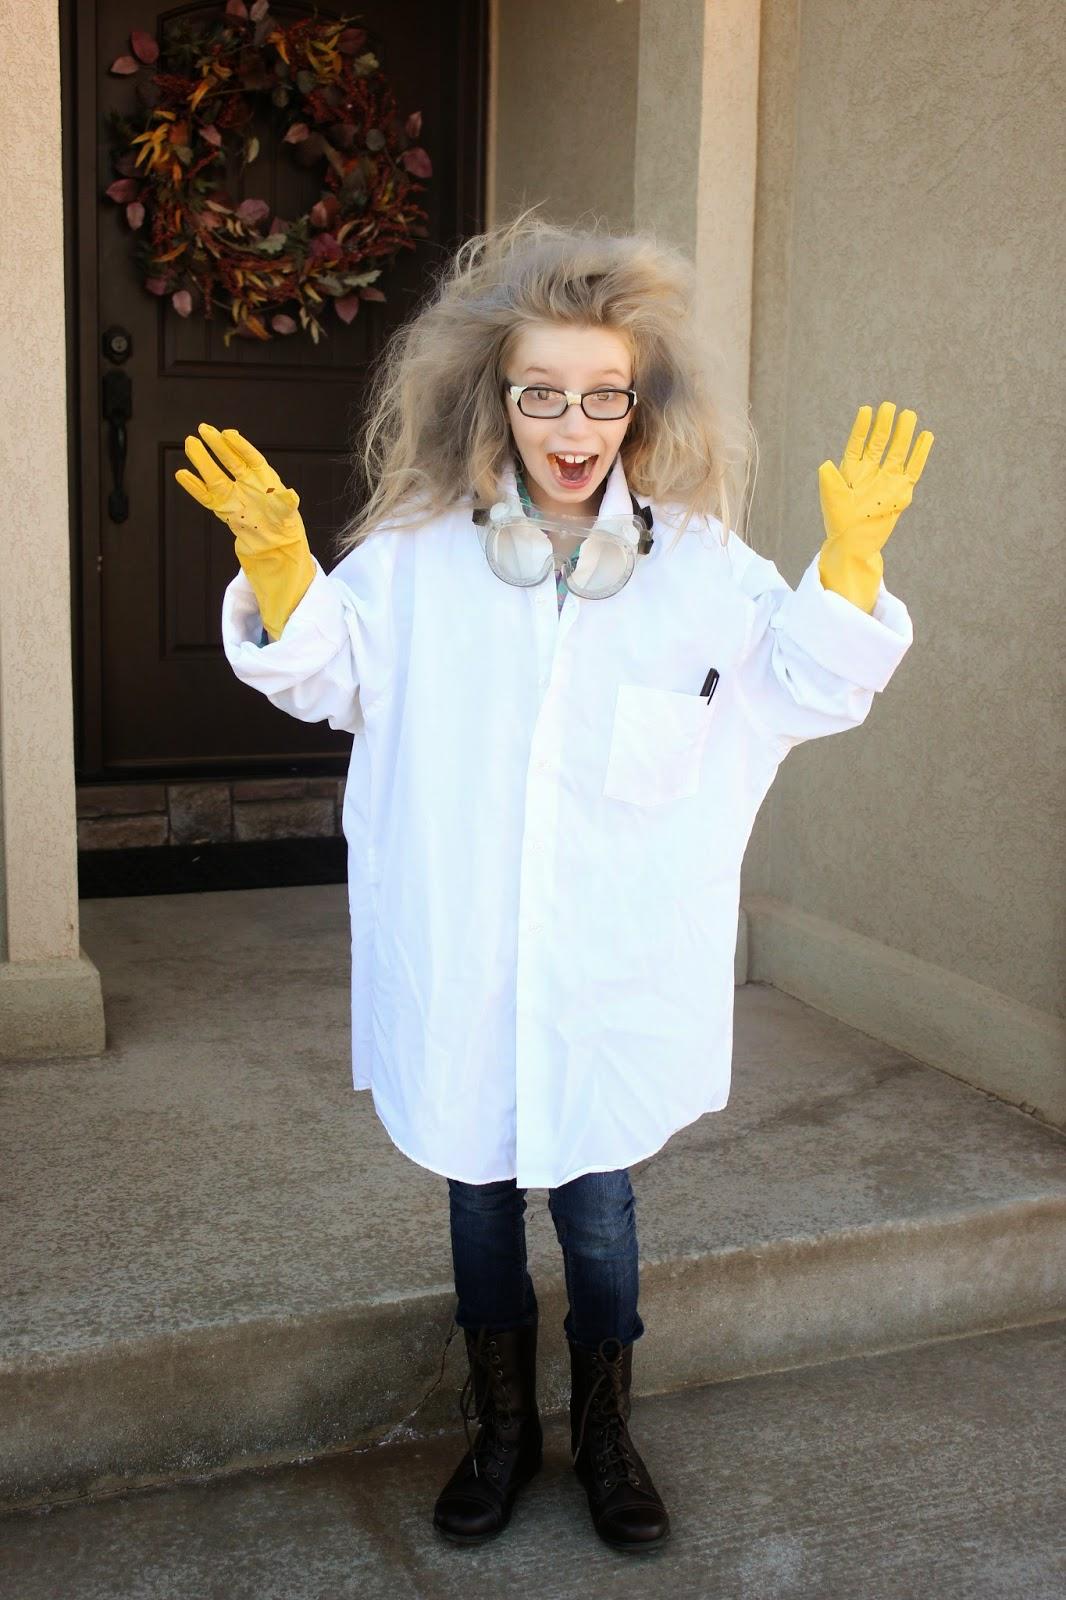 Halloween Mad Scientist Girl Wwwtopsimagescom